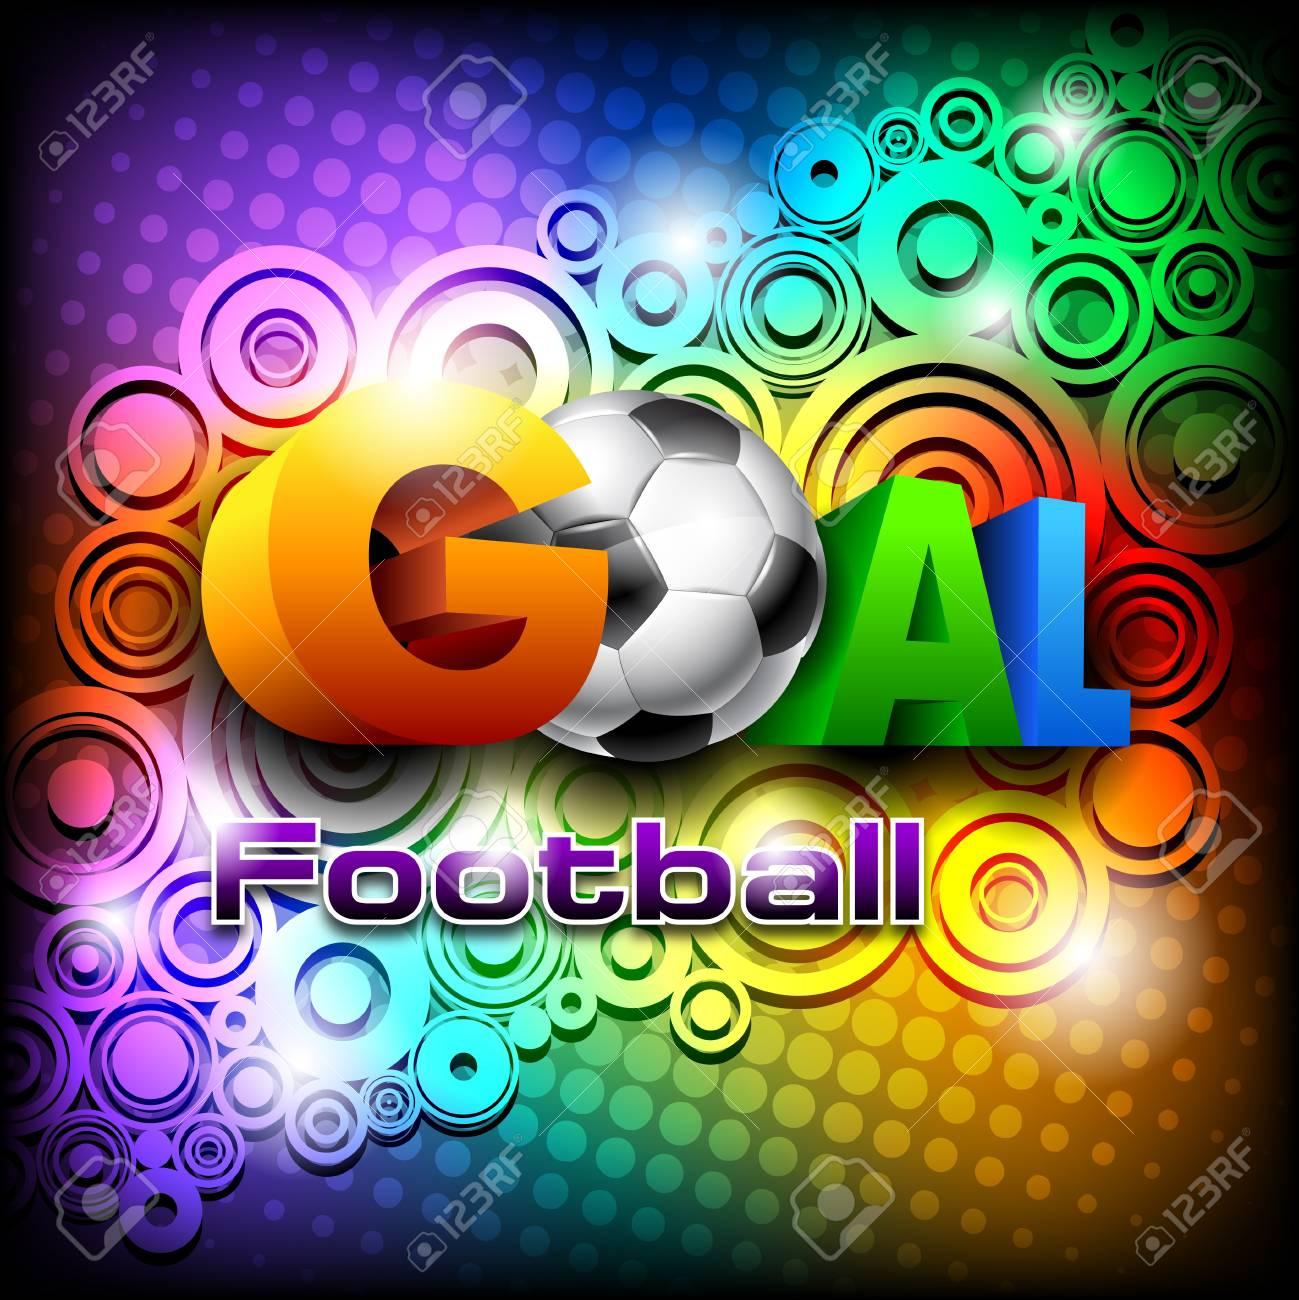 Football Stock Vector - 16426141